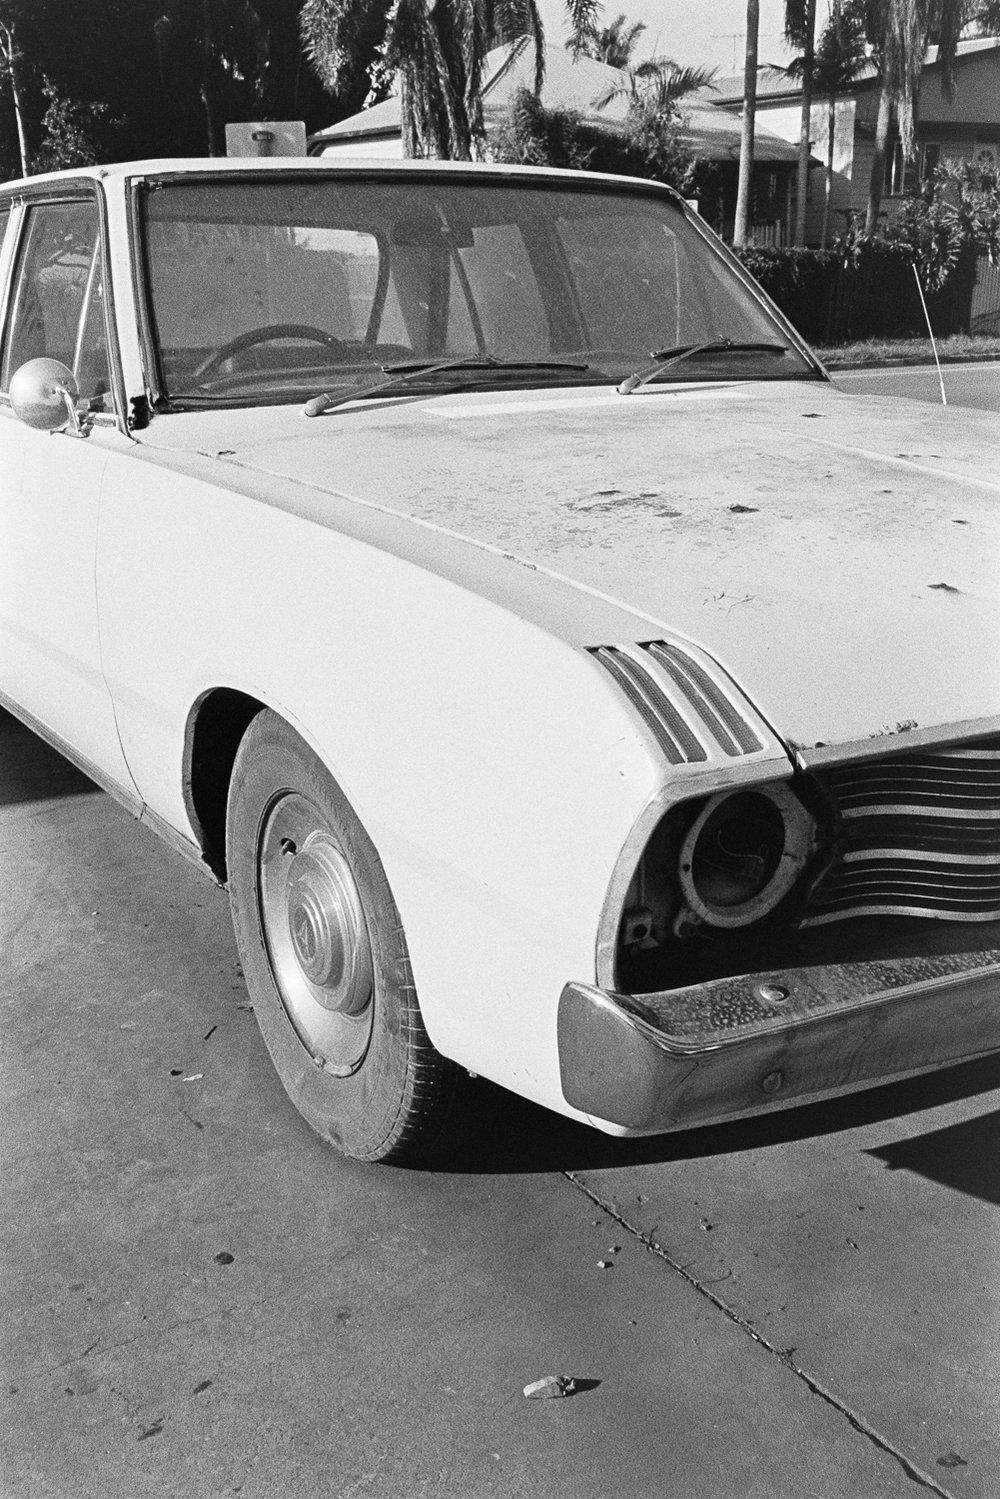 20190105 - Roll 269 - 008-Nick-Bedford,-Photographer-Black and White, Brisbane, Kodak TRI-X 400, Leica M7, Street Photography, Voigtlander 35mm F1.7.jpg